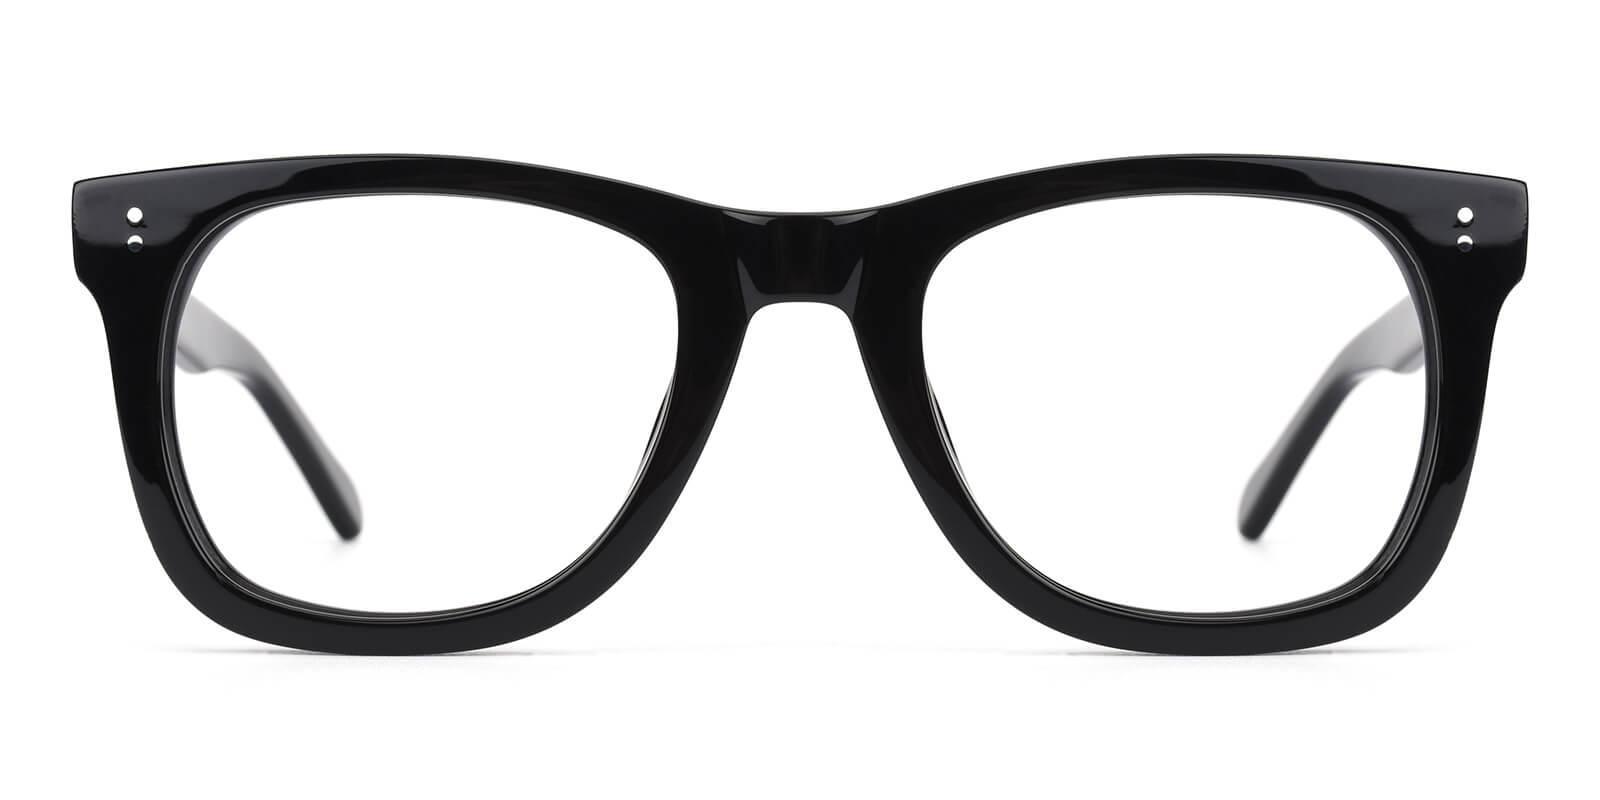 Trend-Black-Square-Acetate-Eyeglasses-additional2